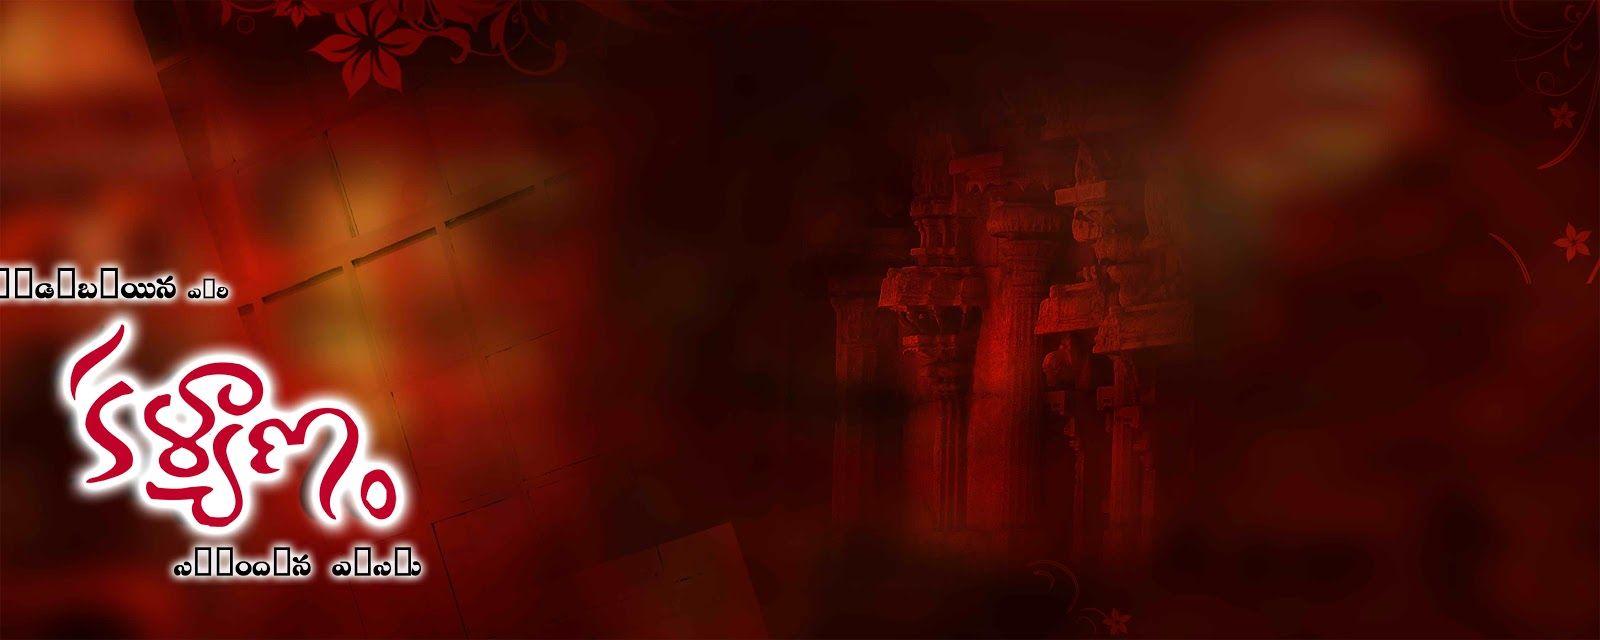 Top 8 Karizma Album Background Psd Files Free Download 12x36